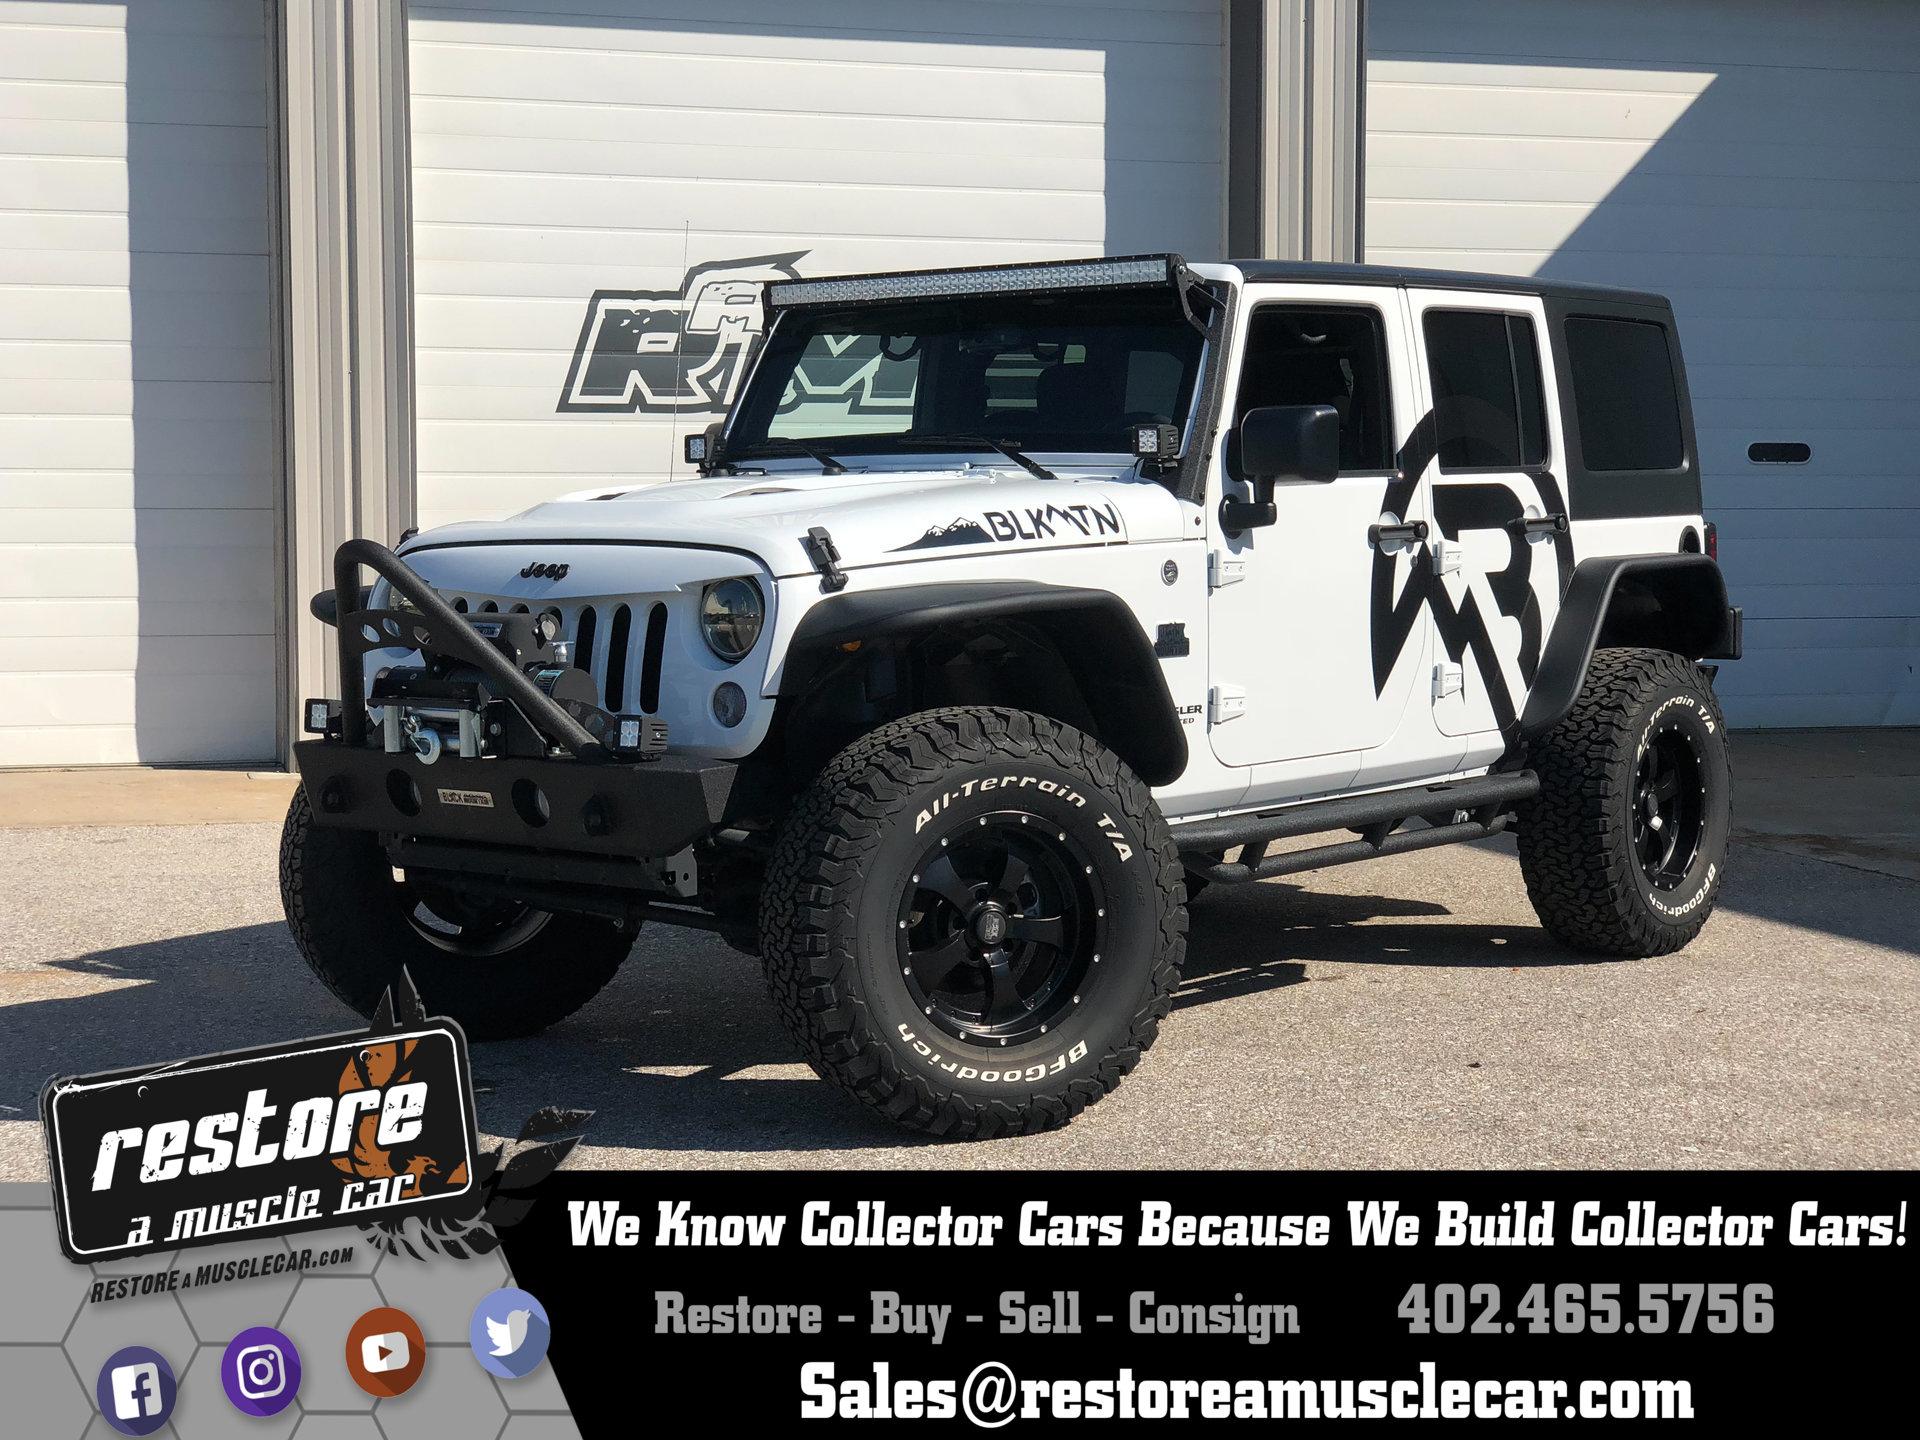 264532056a3a1 hd 2017 jeep wrangler